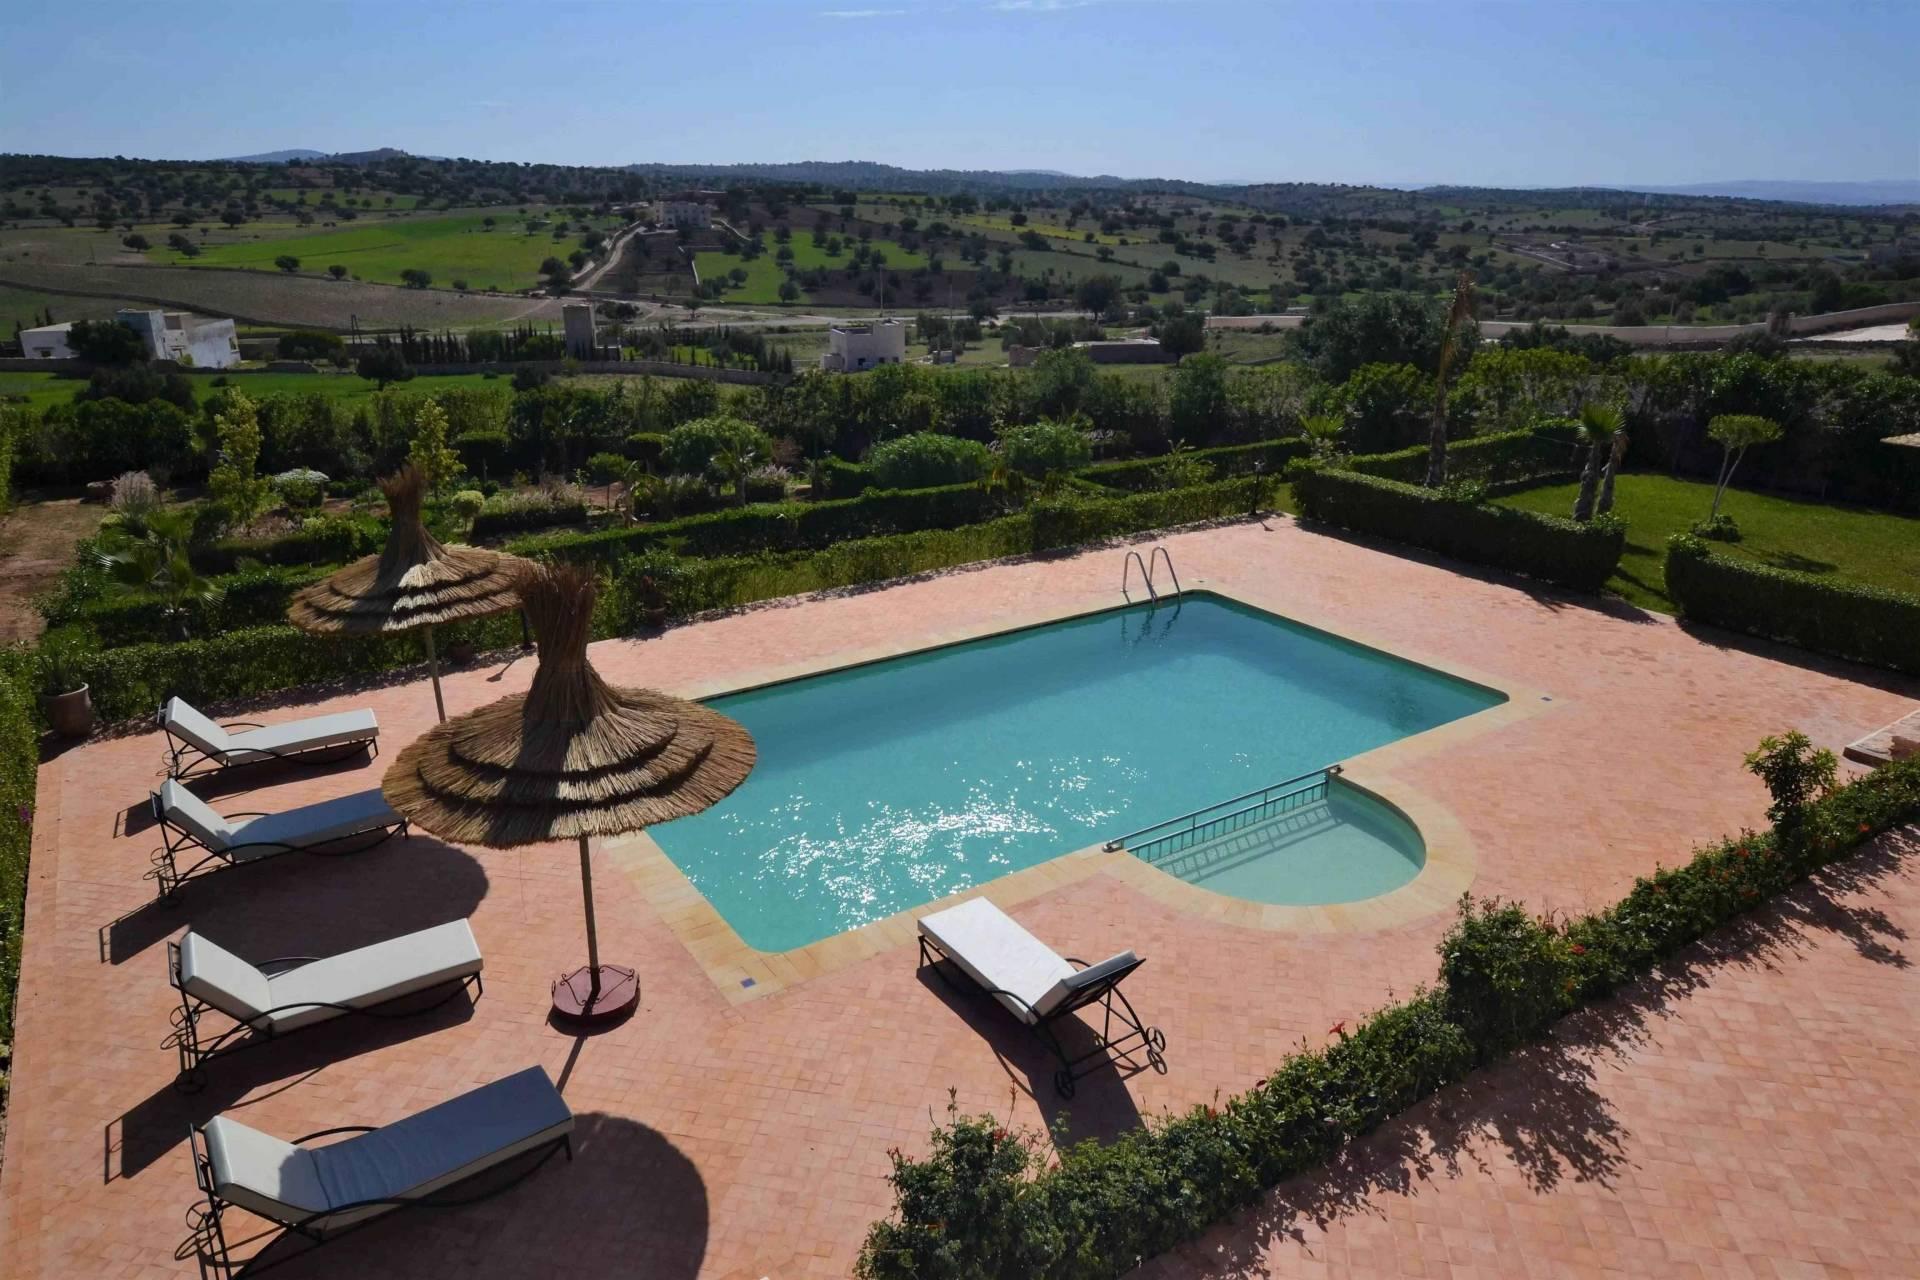 Location - Maison de campagne - 250 m² - Campagne - 1500 € - Essaouira - 9081